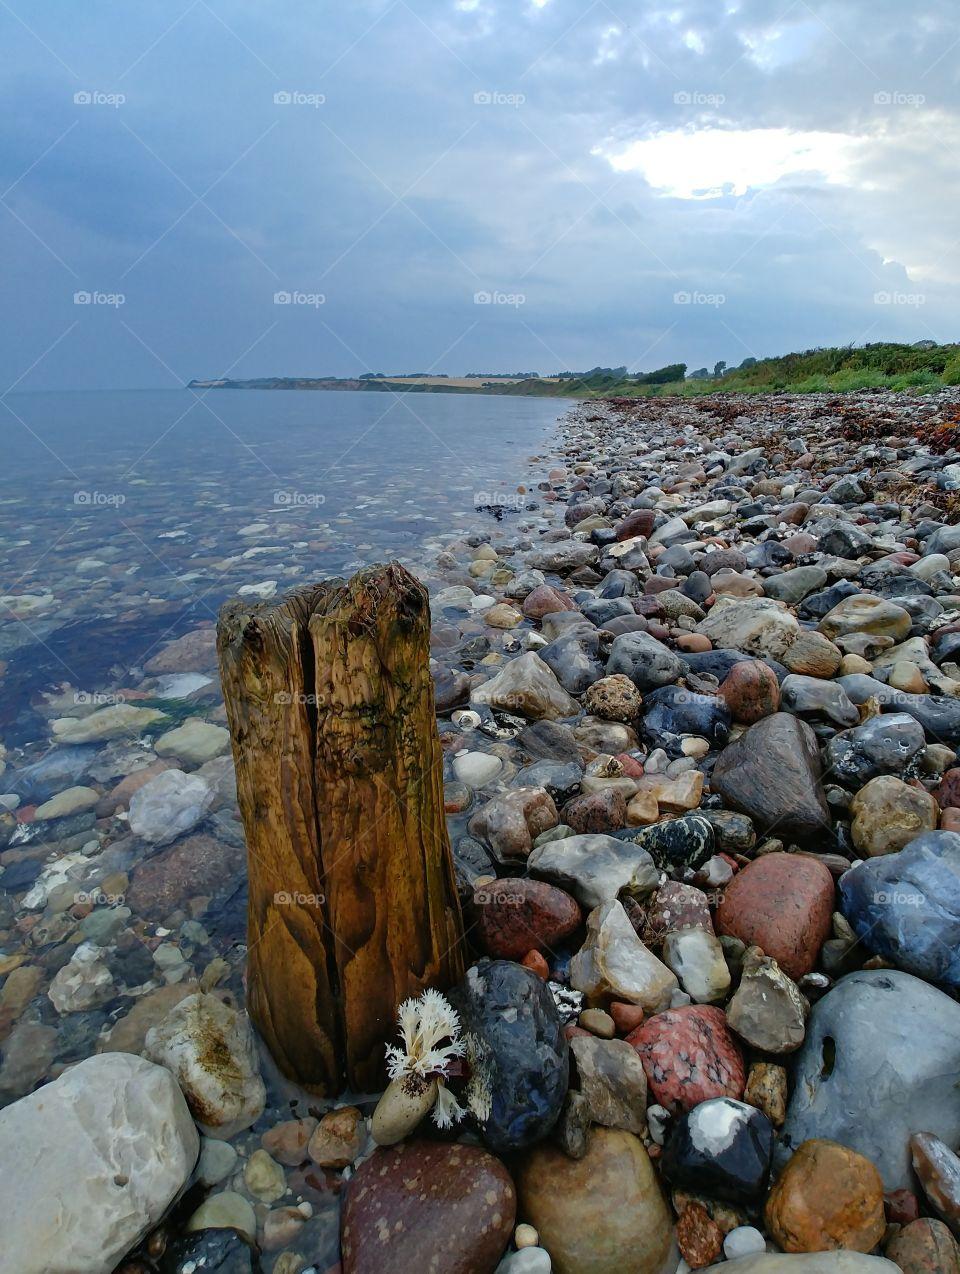 abend Strand holz Treibholz steine stone